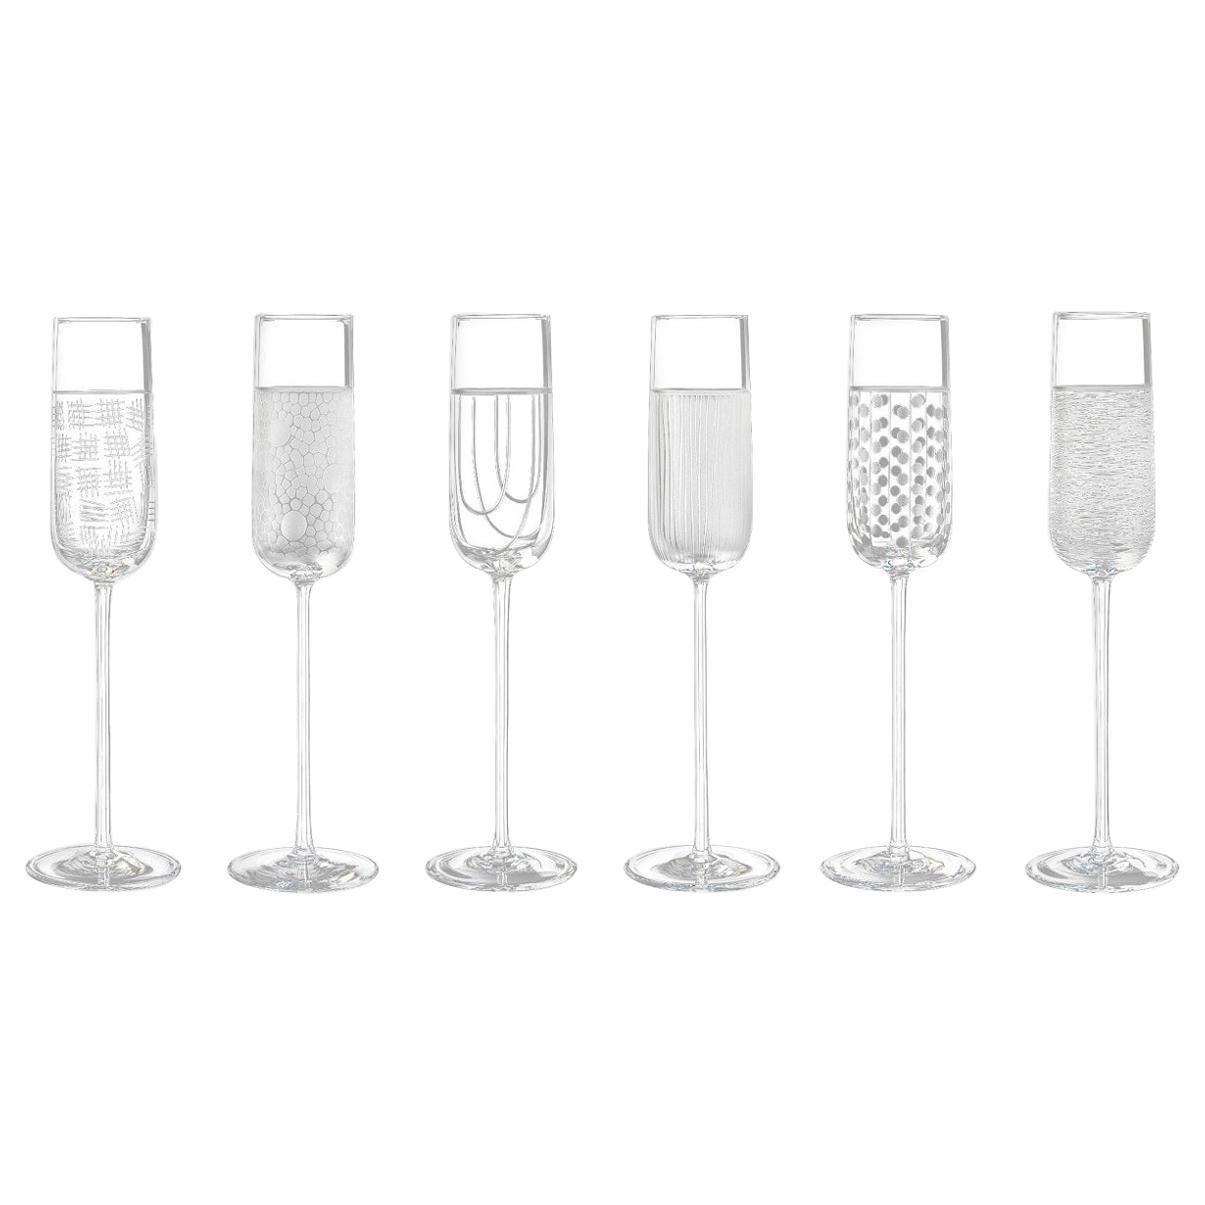 Salviati Nove Set of 6 Flute Assorted Glasses